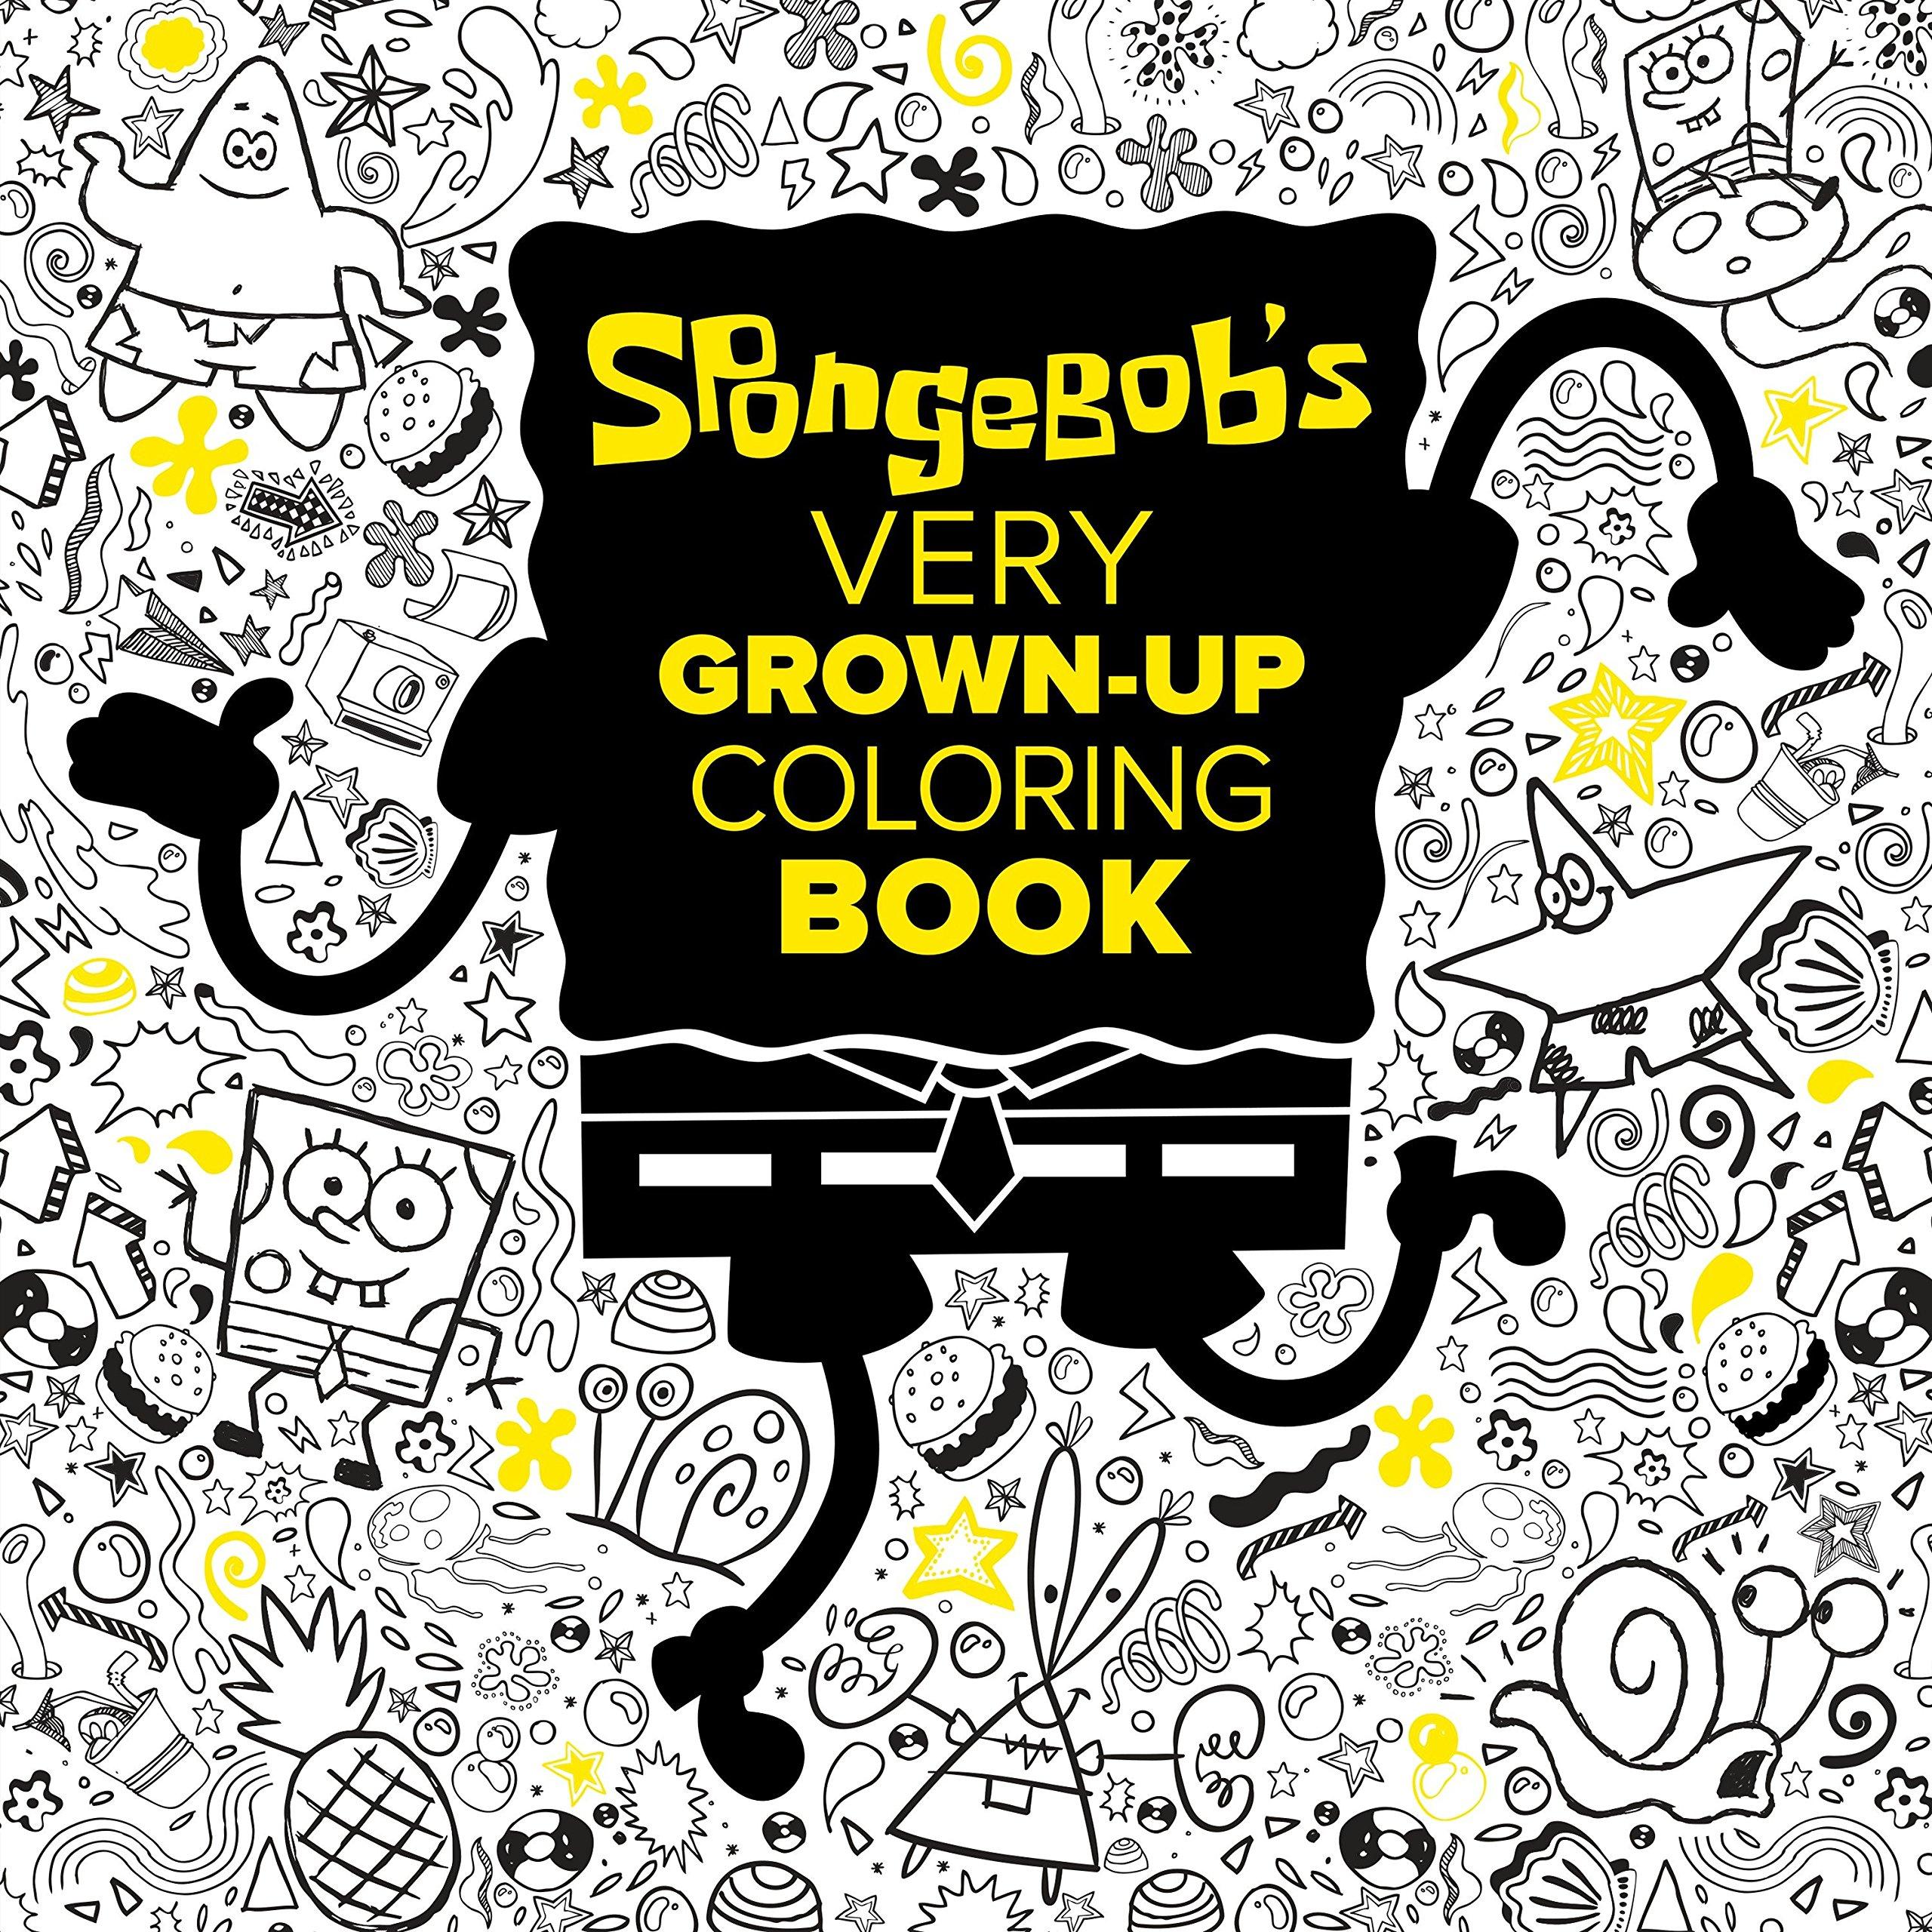 Spongebob S Very Grown Up Coloring Book Spongebob Squarepants Adult Coloring Book Random House Schigiel Gregg 9781524701420 Amazon Com Books